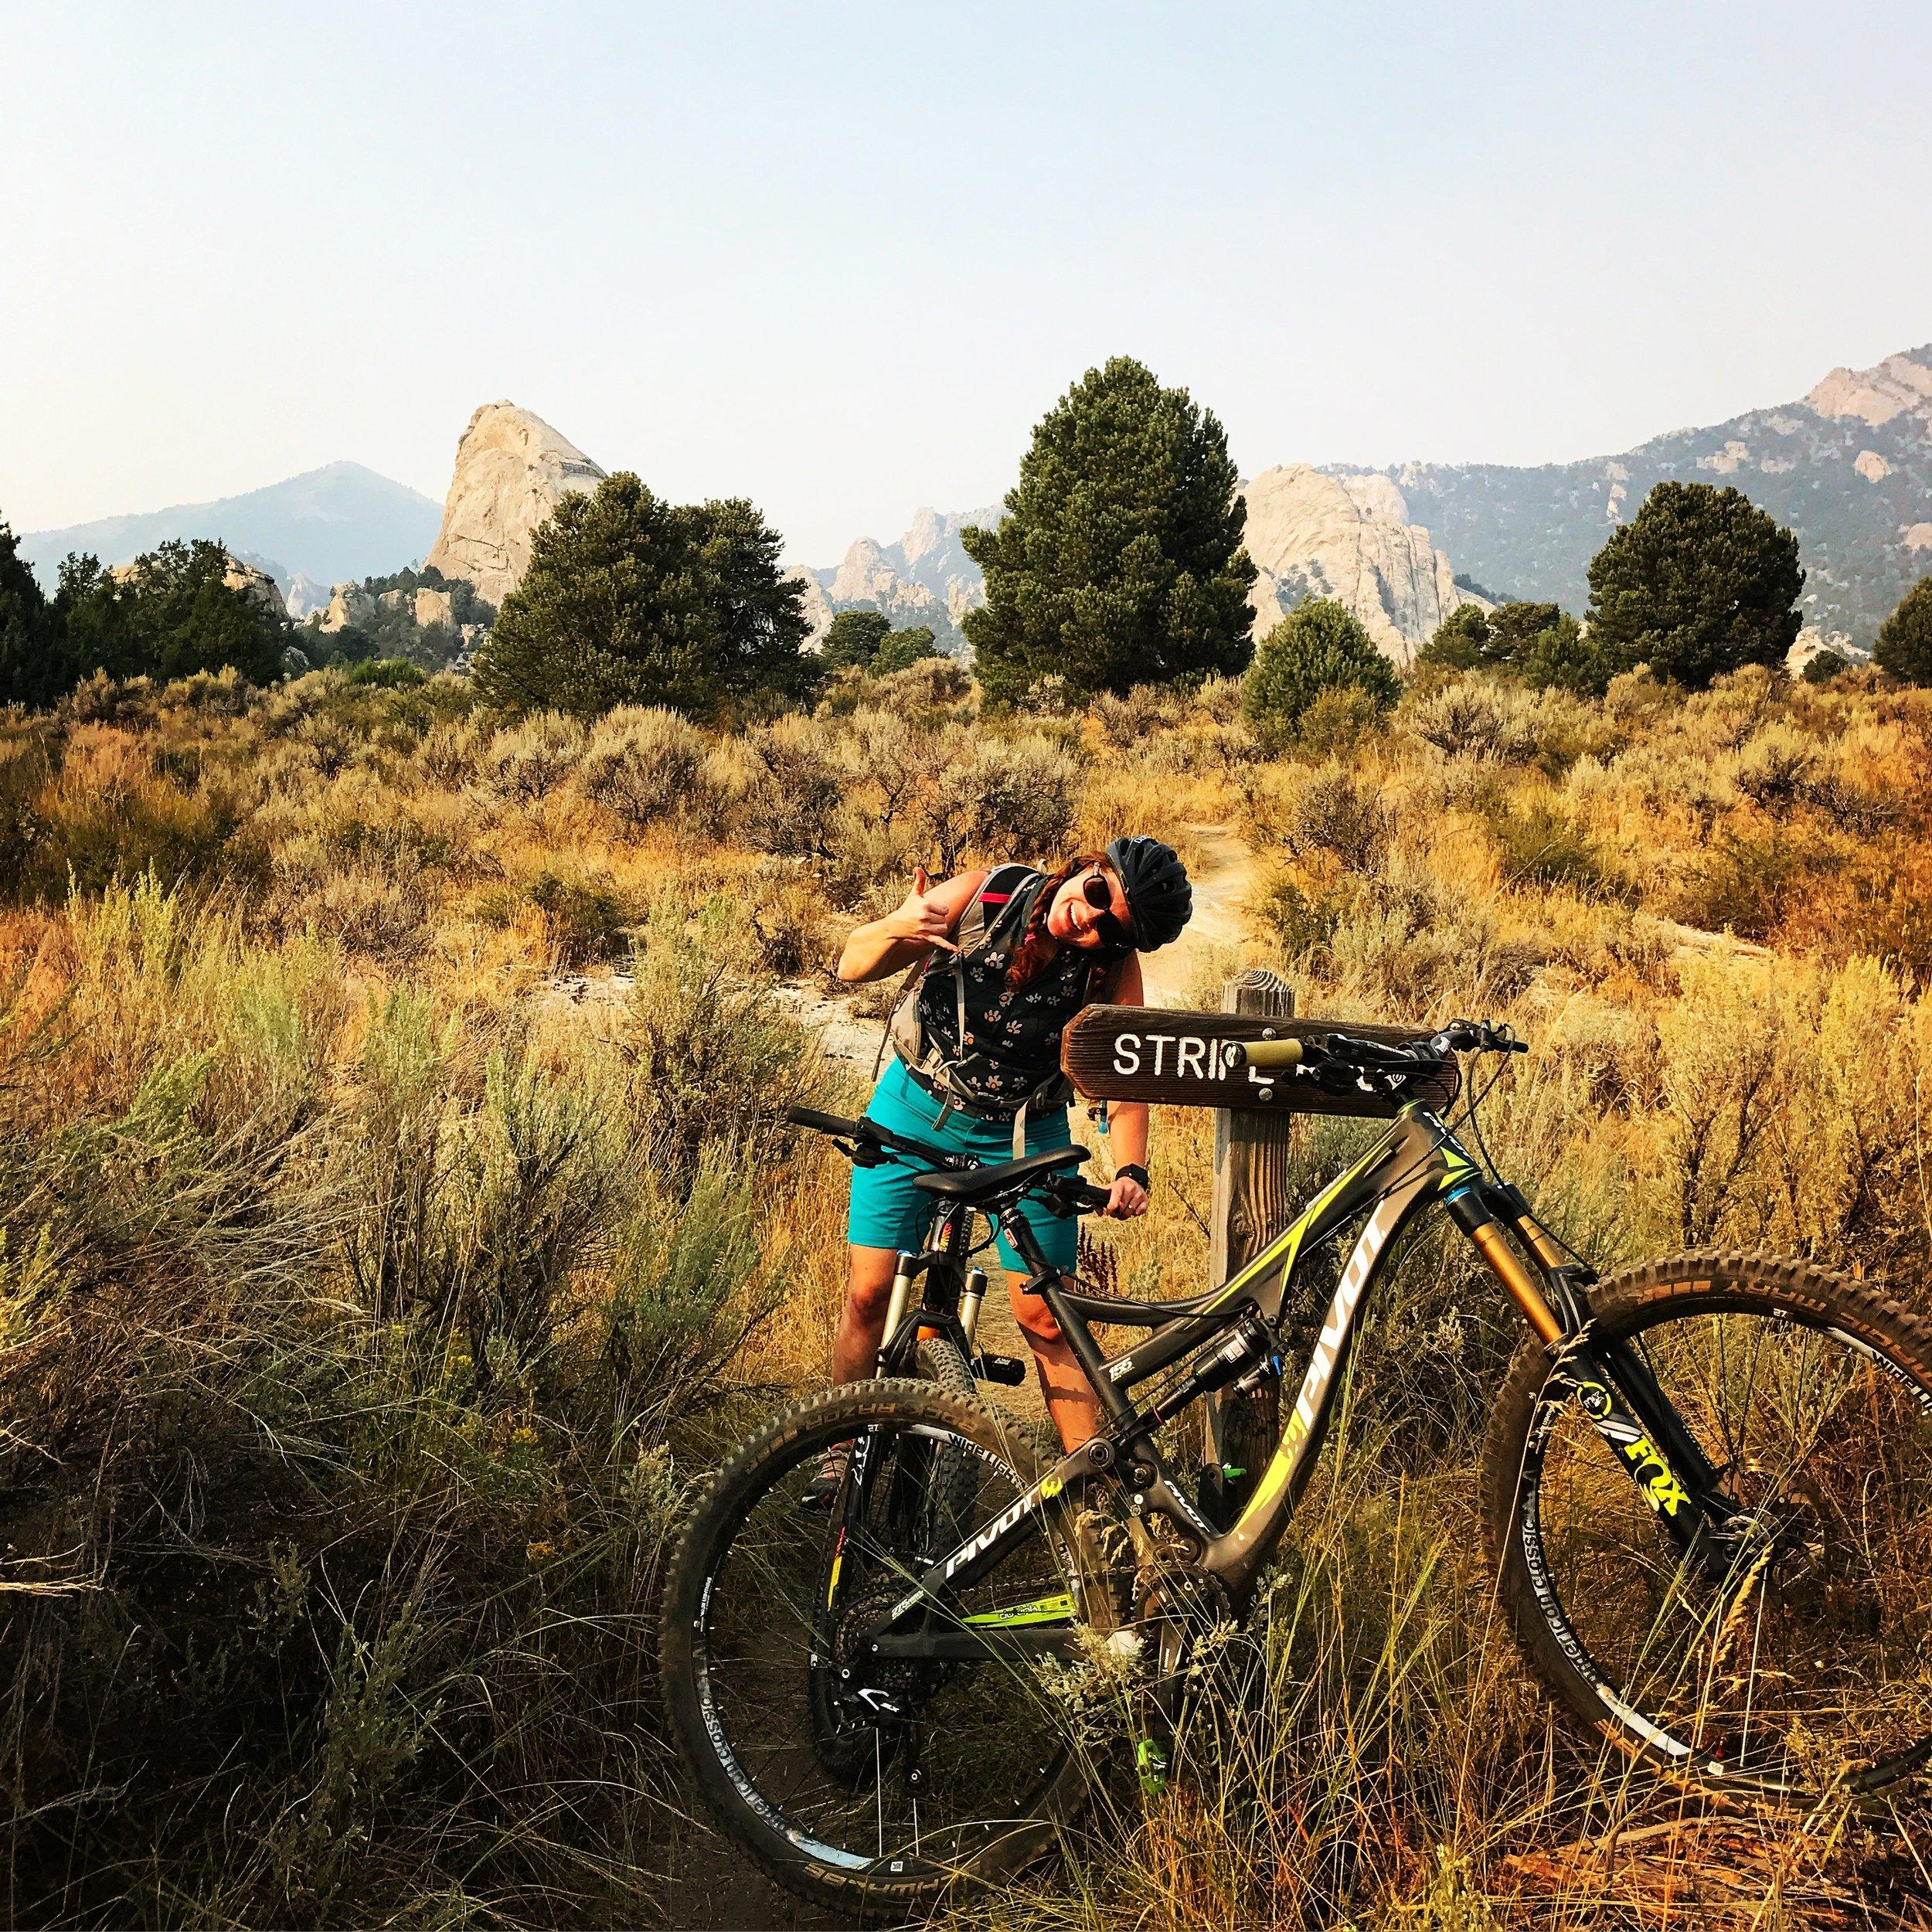 Mountain biking in the City of Rocks, Idaho...who knew?!?!